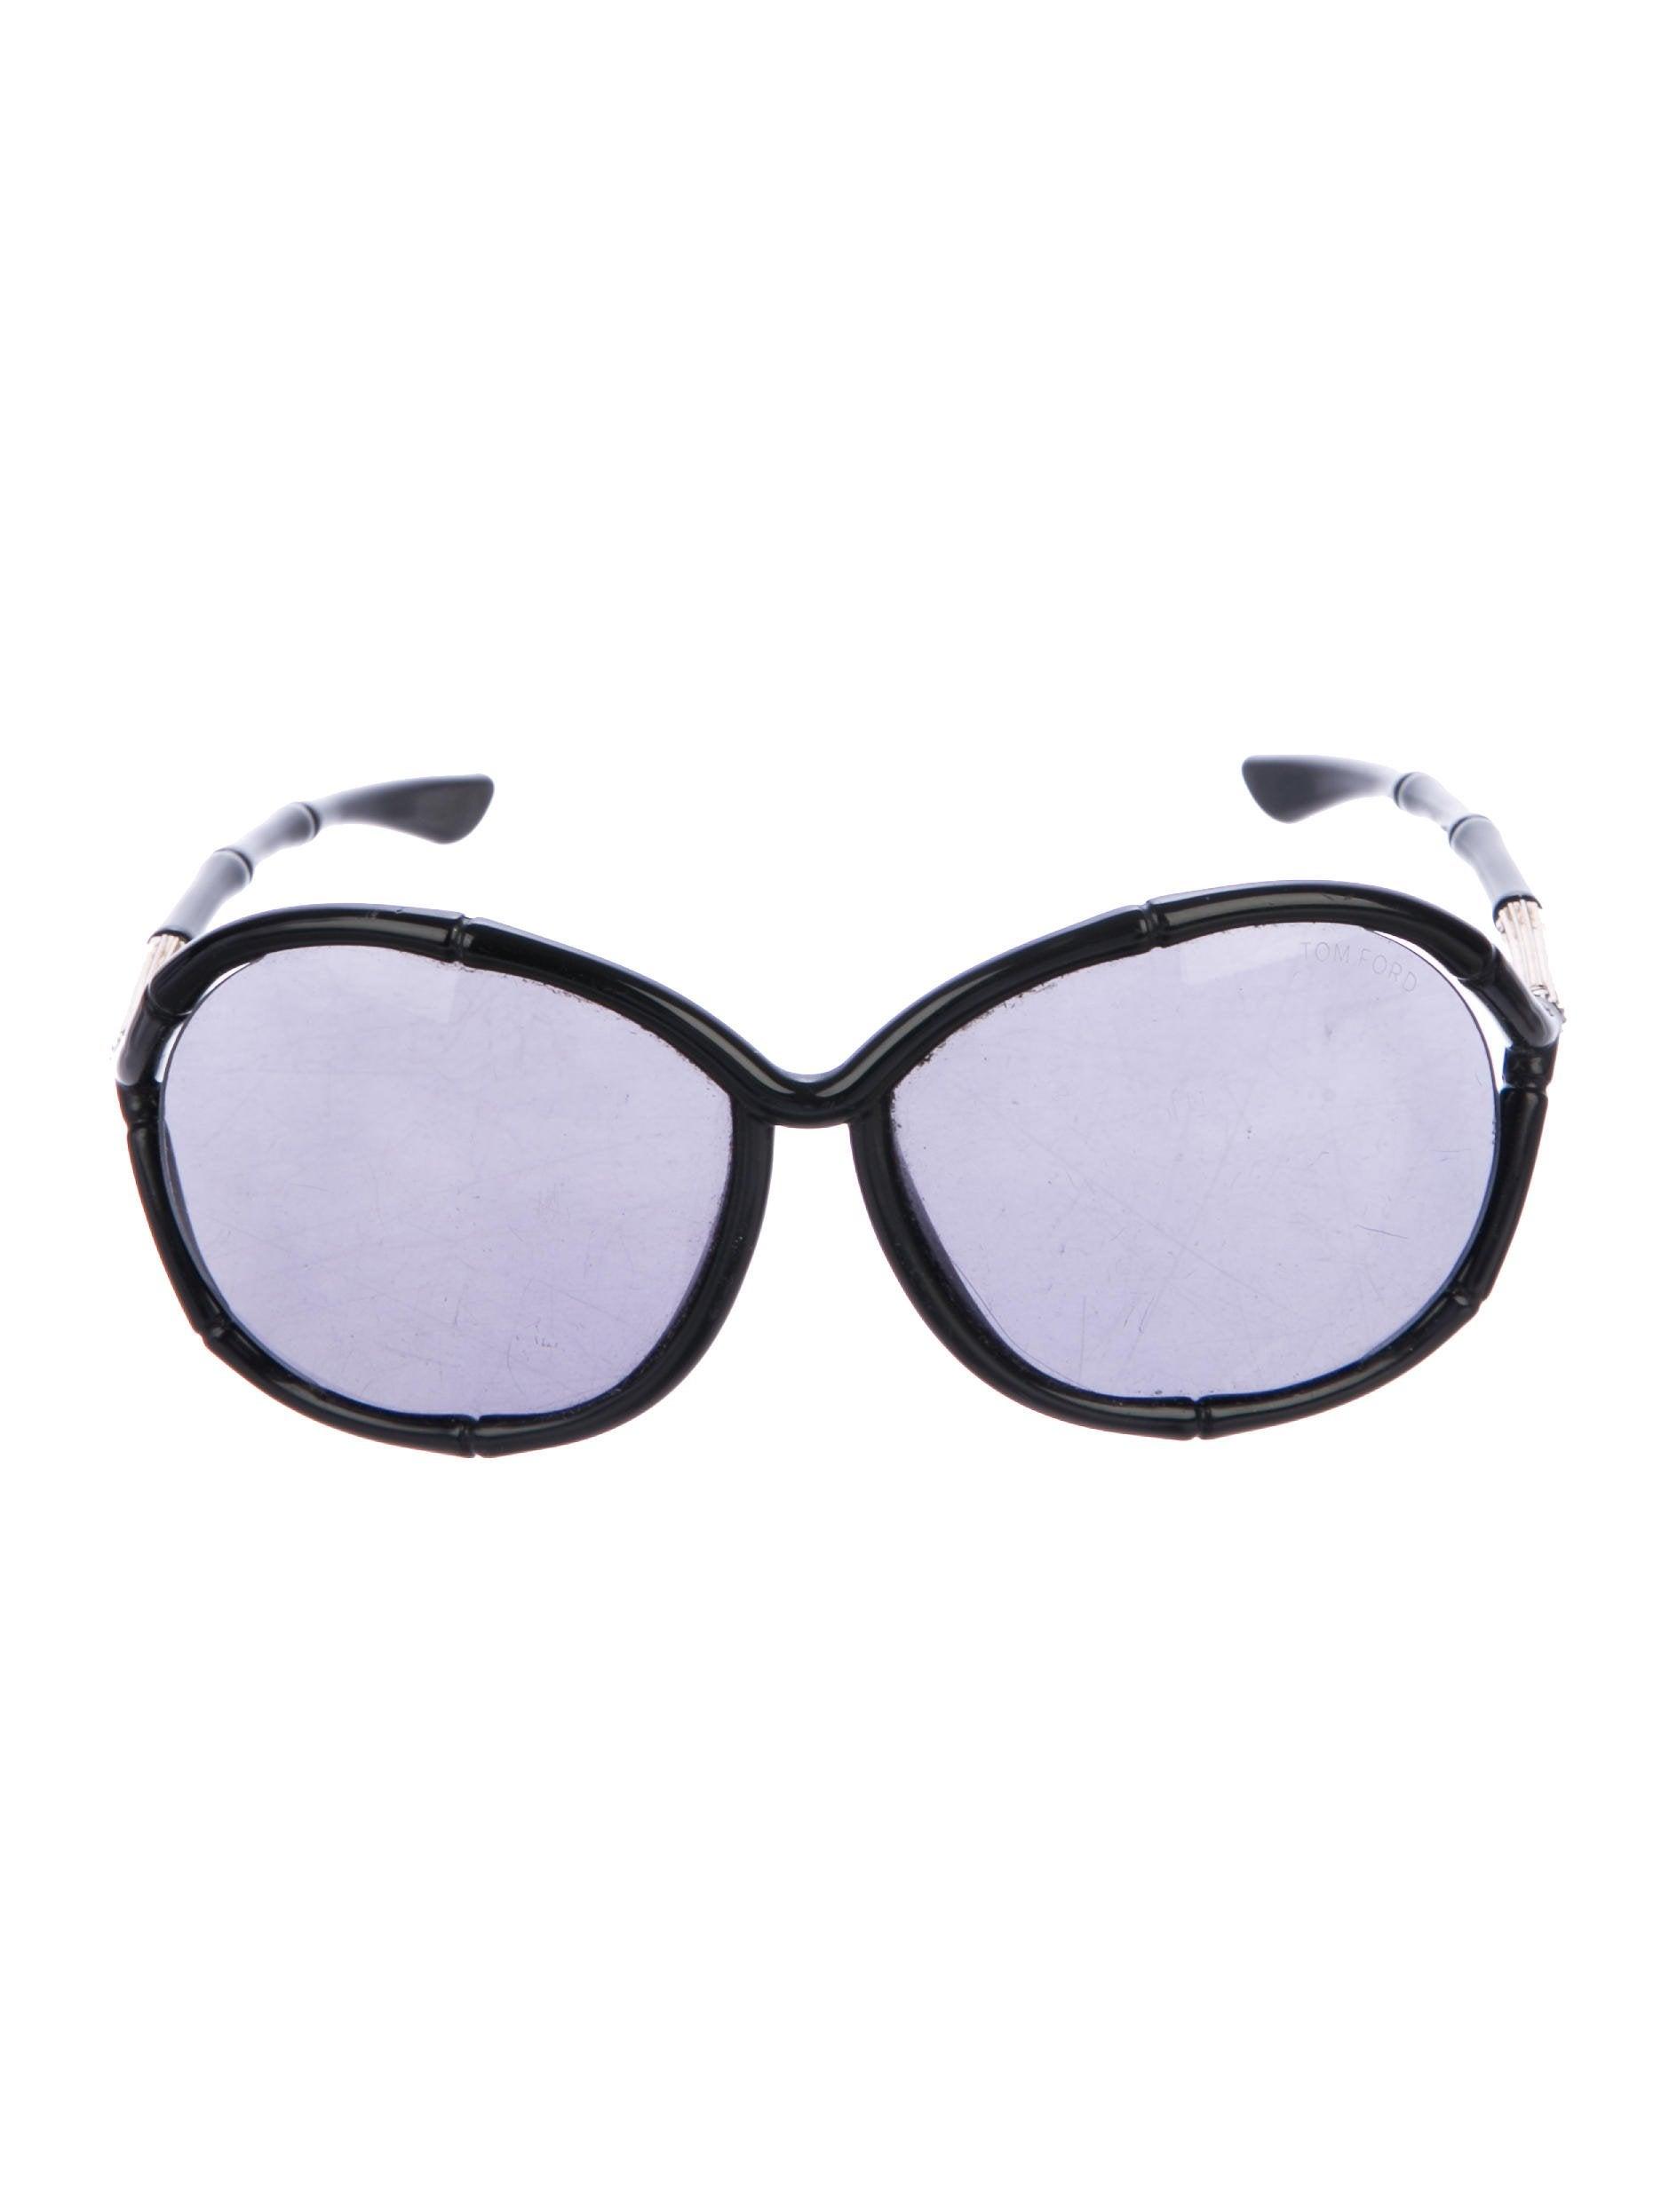 865c3ccd405 Tom Ford Claudia Oversize Sunglasses - Accessories - TOM49402